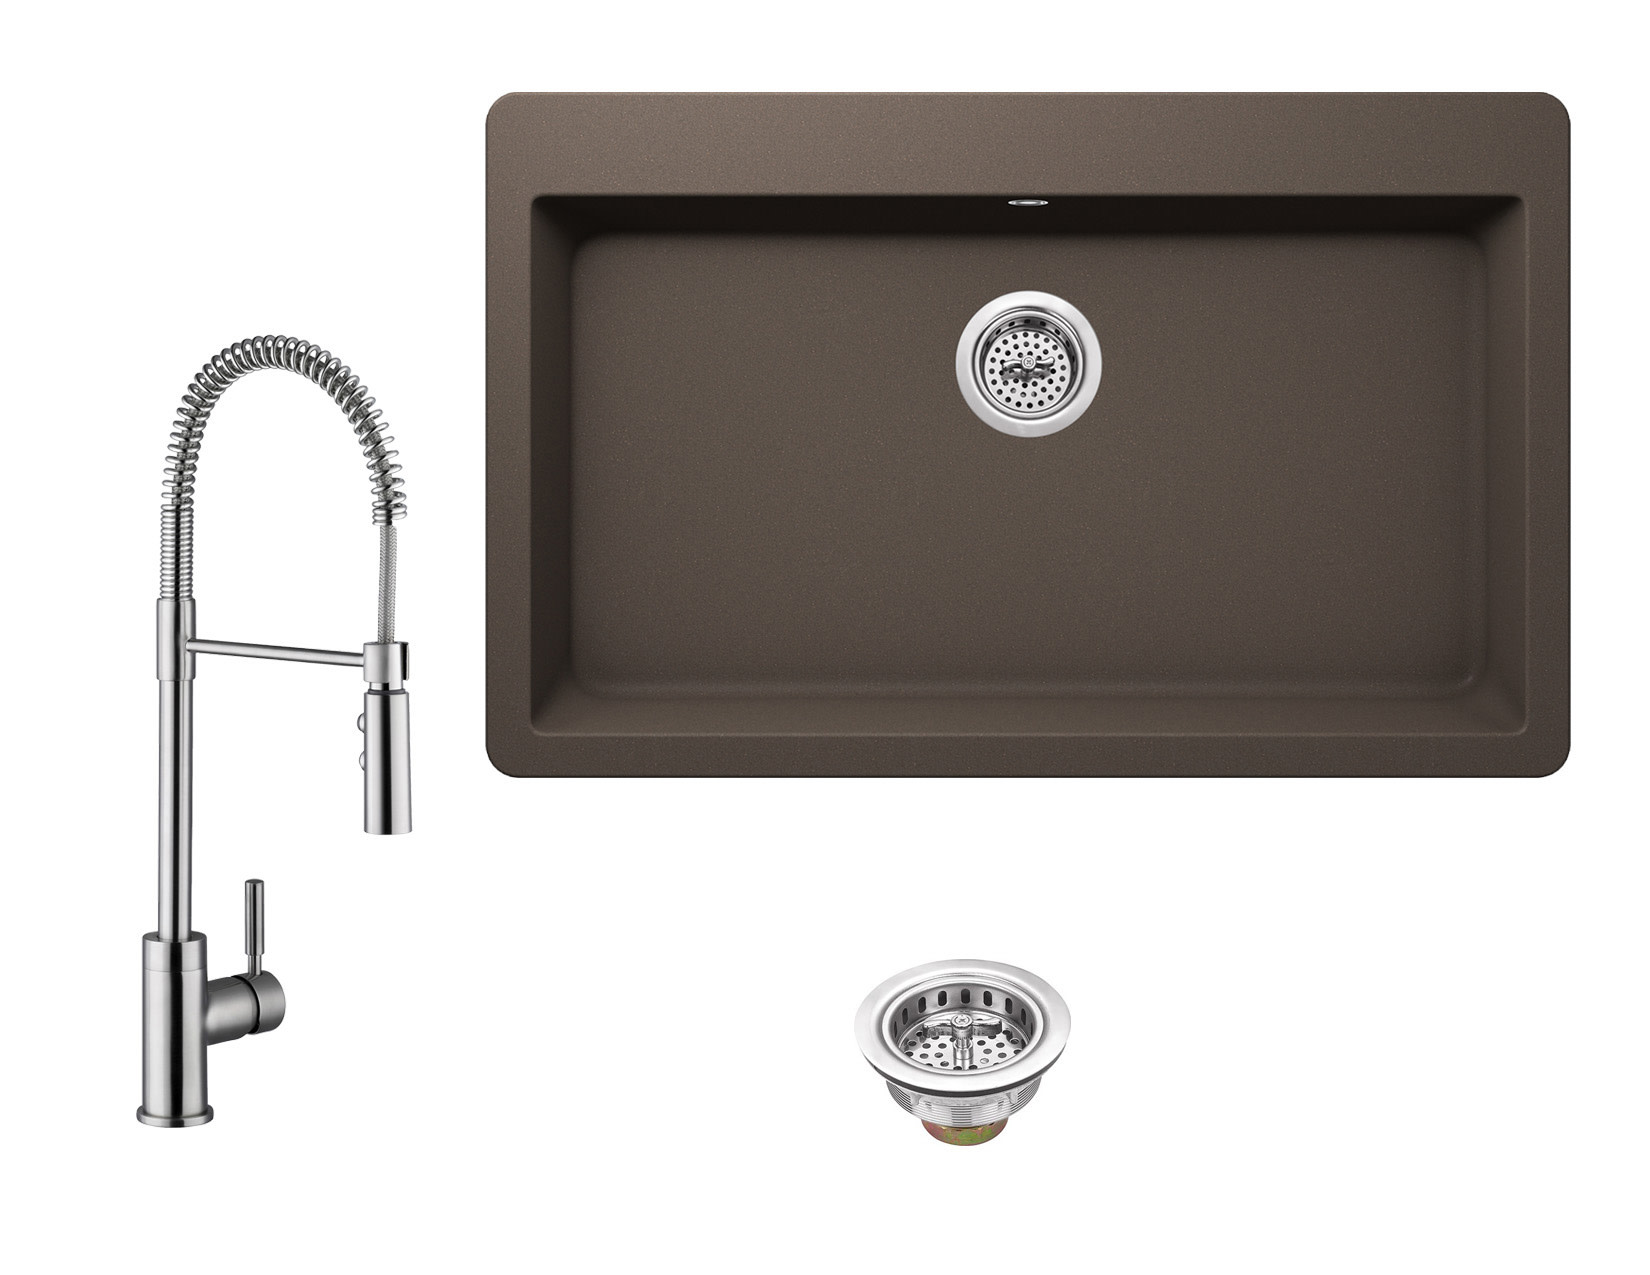 Details About Miseno Mgr3321 Mk6557 33 Drop In Single Basin Granite Composite Kitchen Sink Wi